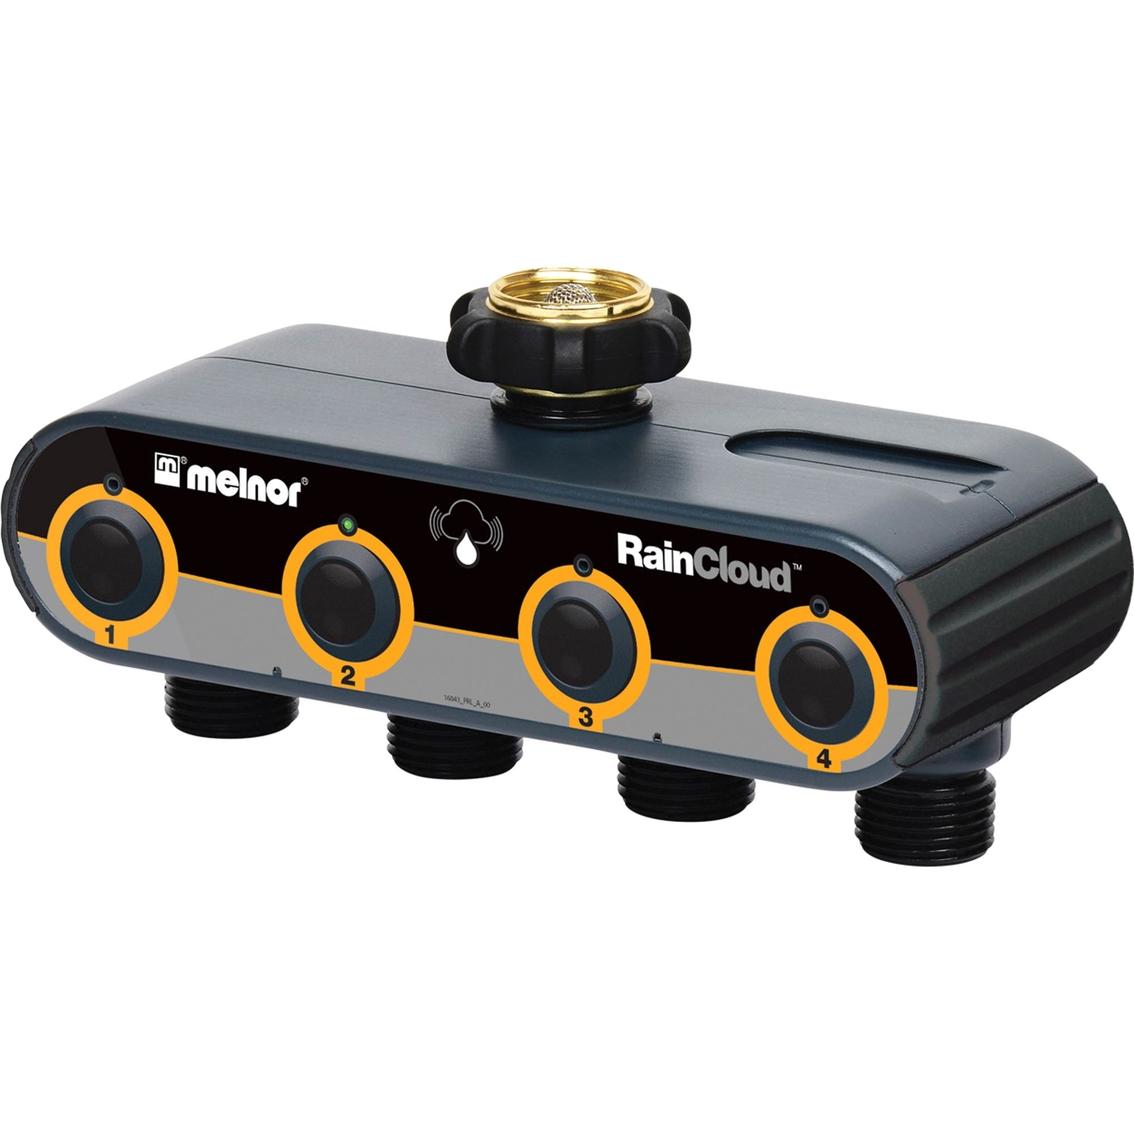 Melnor Wireless Timer Faucet Unit | Hoses & Sprinklers | More | Shop ...